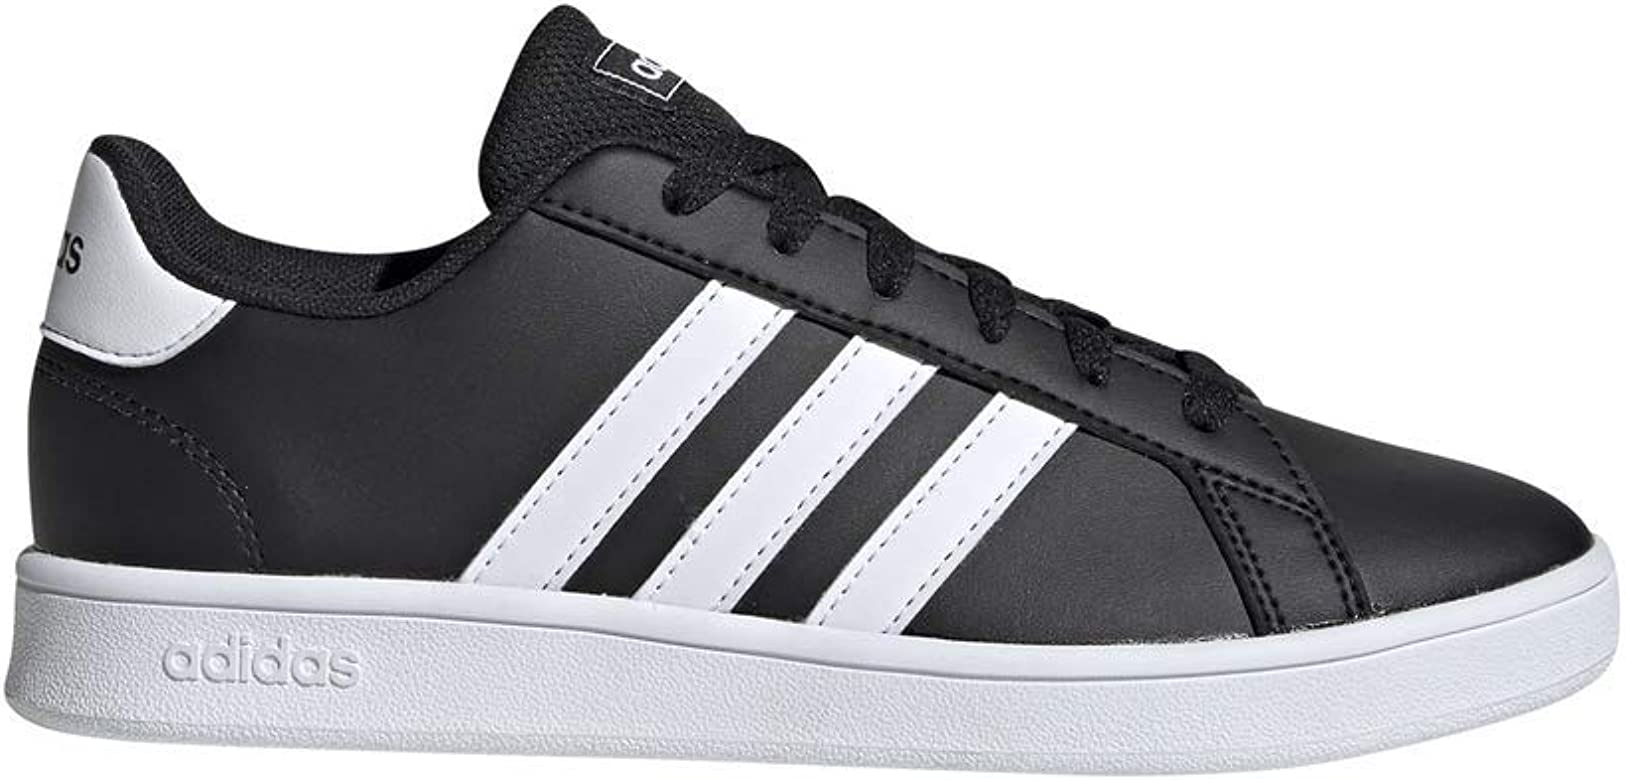 Grand Court Wide Tennis Shoe